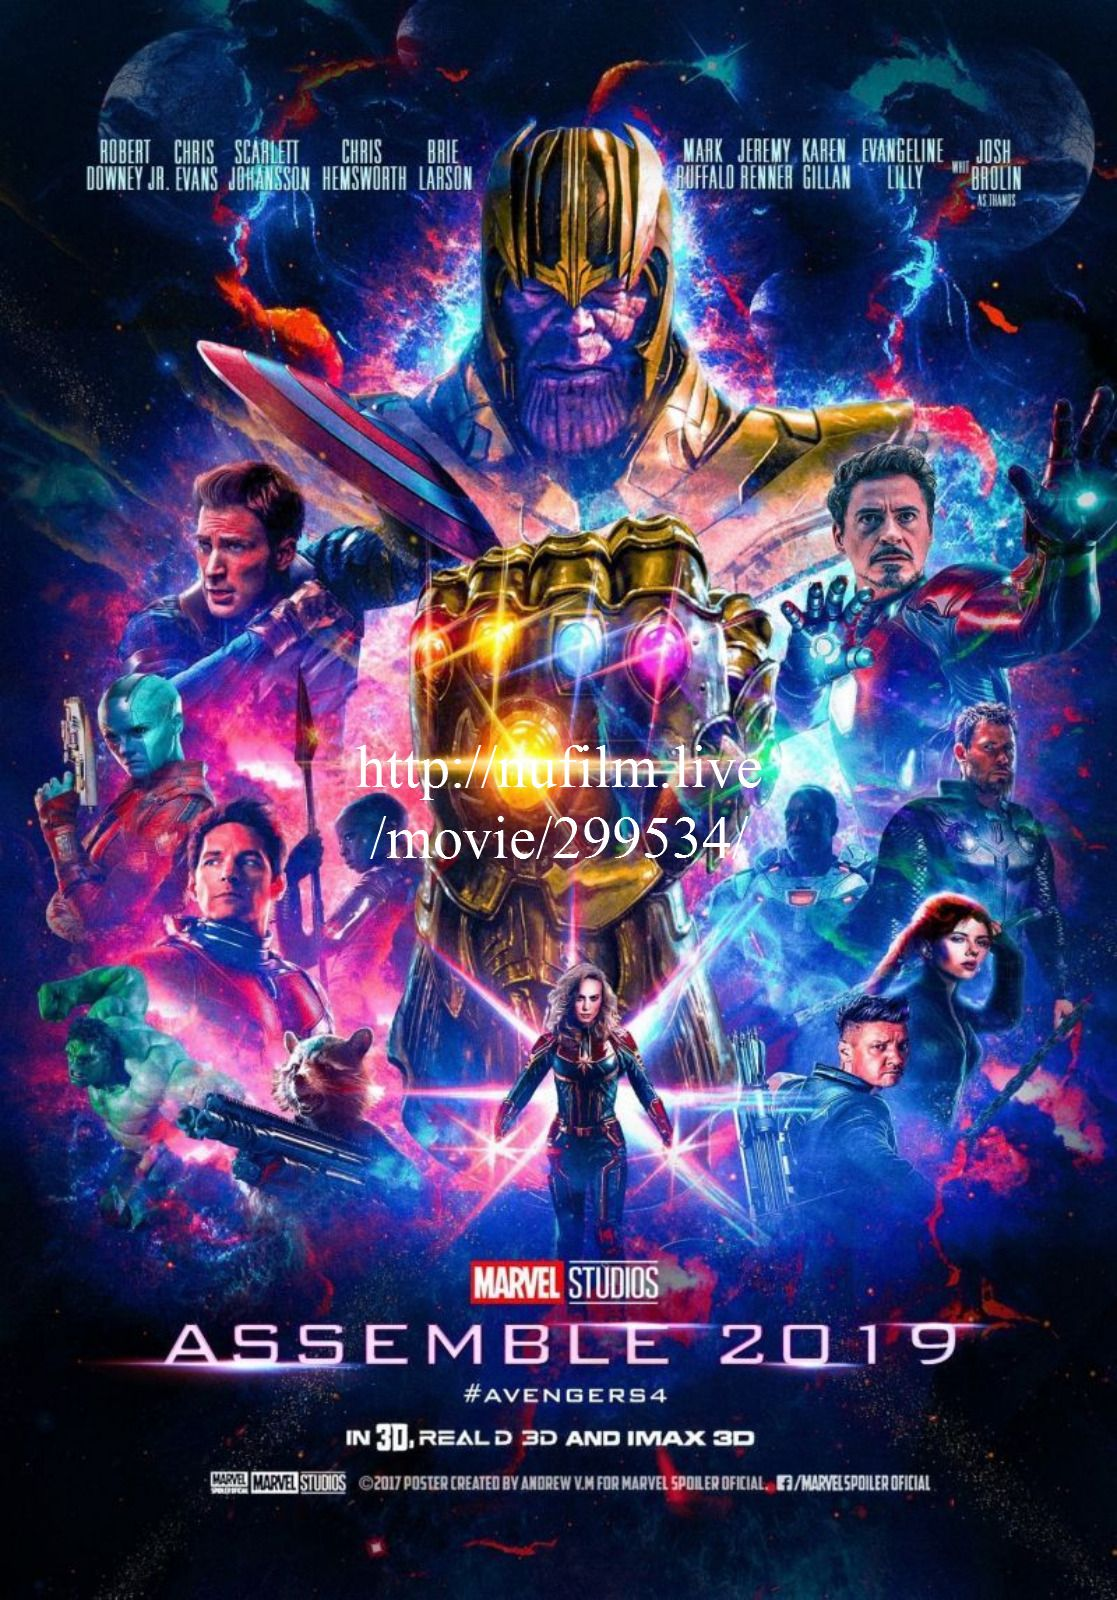 Bosszuallok Vegjatek 2019 Teljes Film Magyarul Videa Dydf In 2020 Avengers Movies Marvel Posters Marvel Avengers